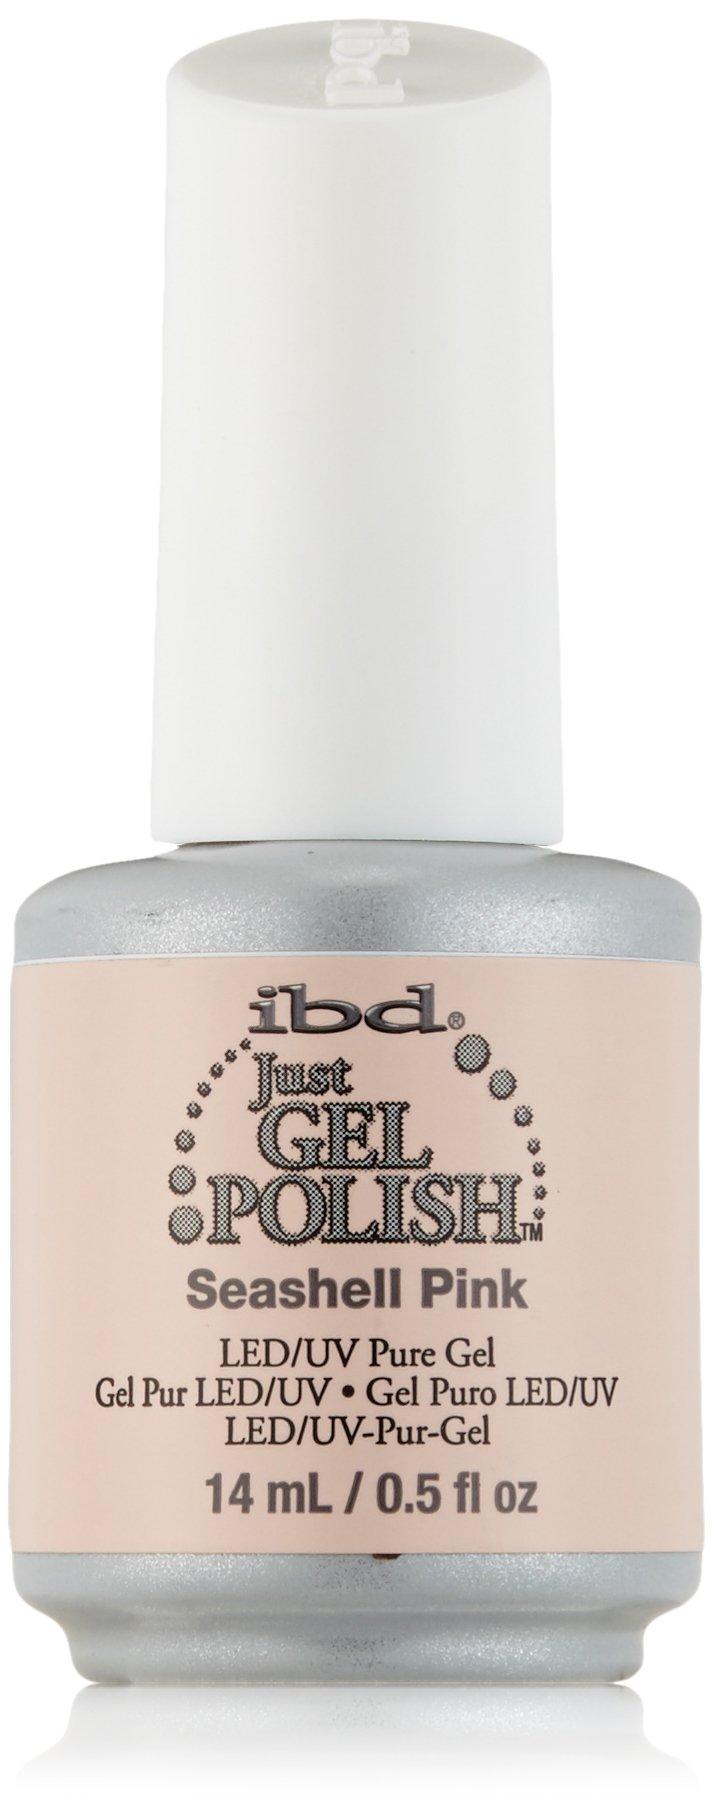 Ibd Ibd Ibd Just Gel Polish Led/uv Gel - Seashell Pink